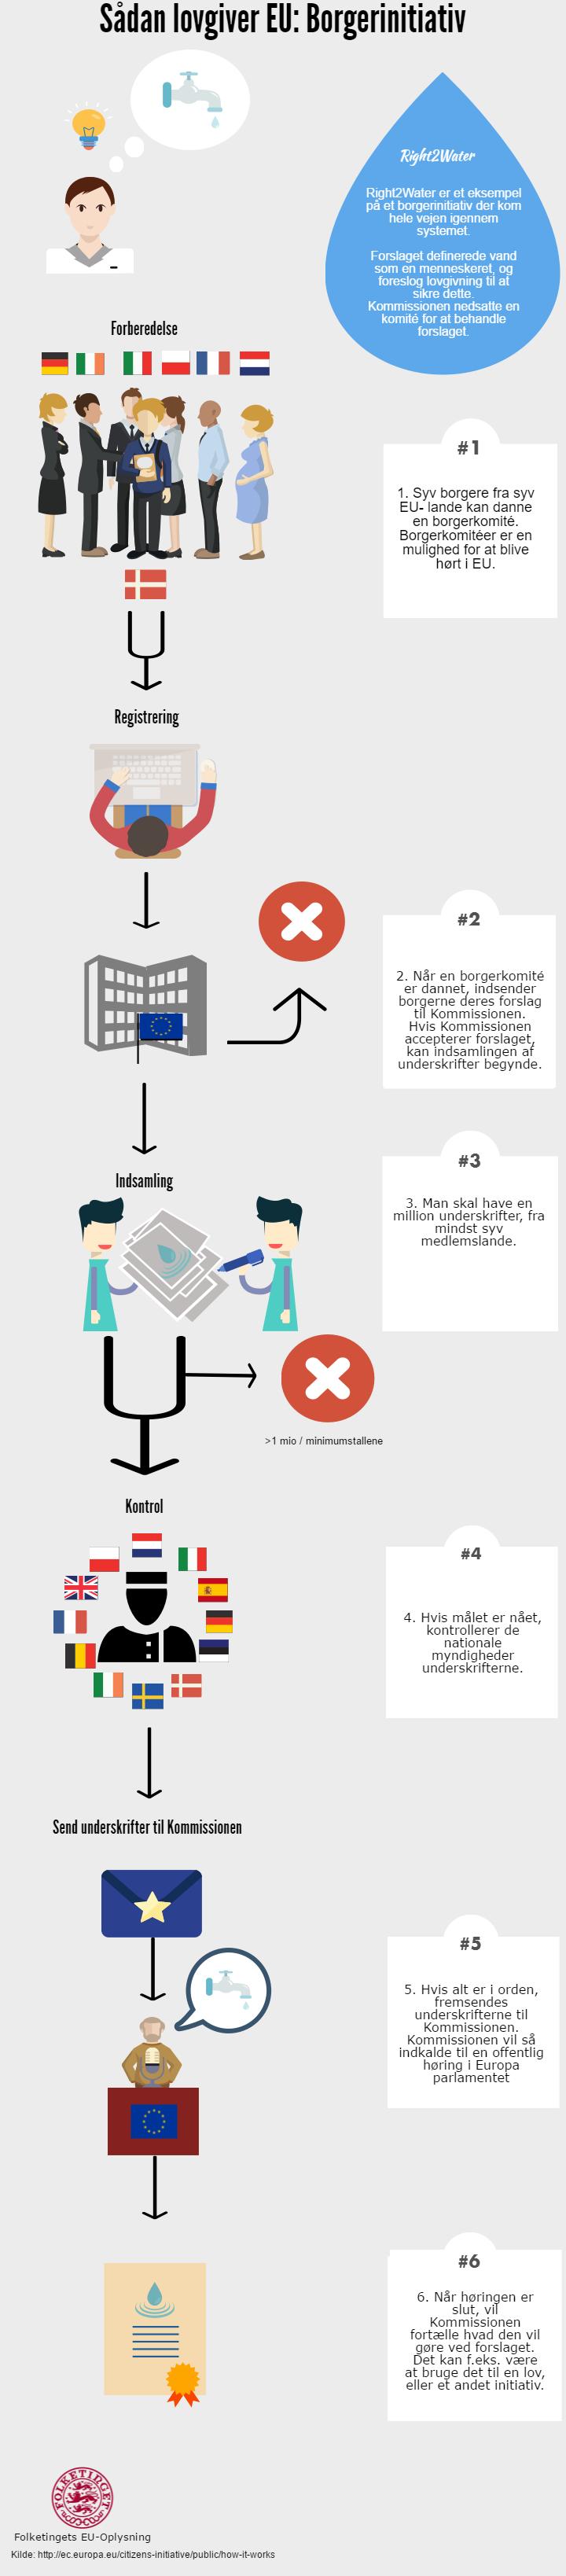 Illustration af EU's Borgerinitiativ